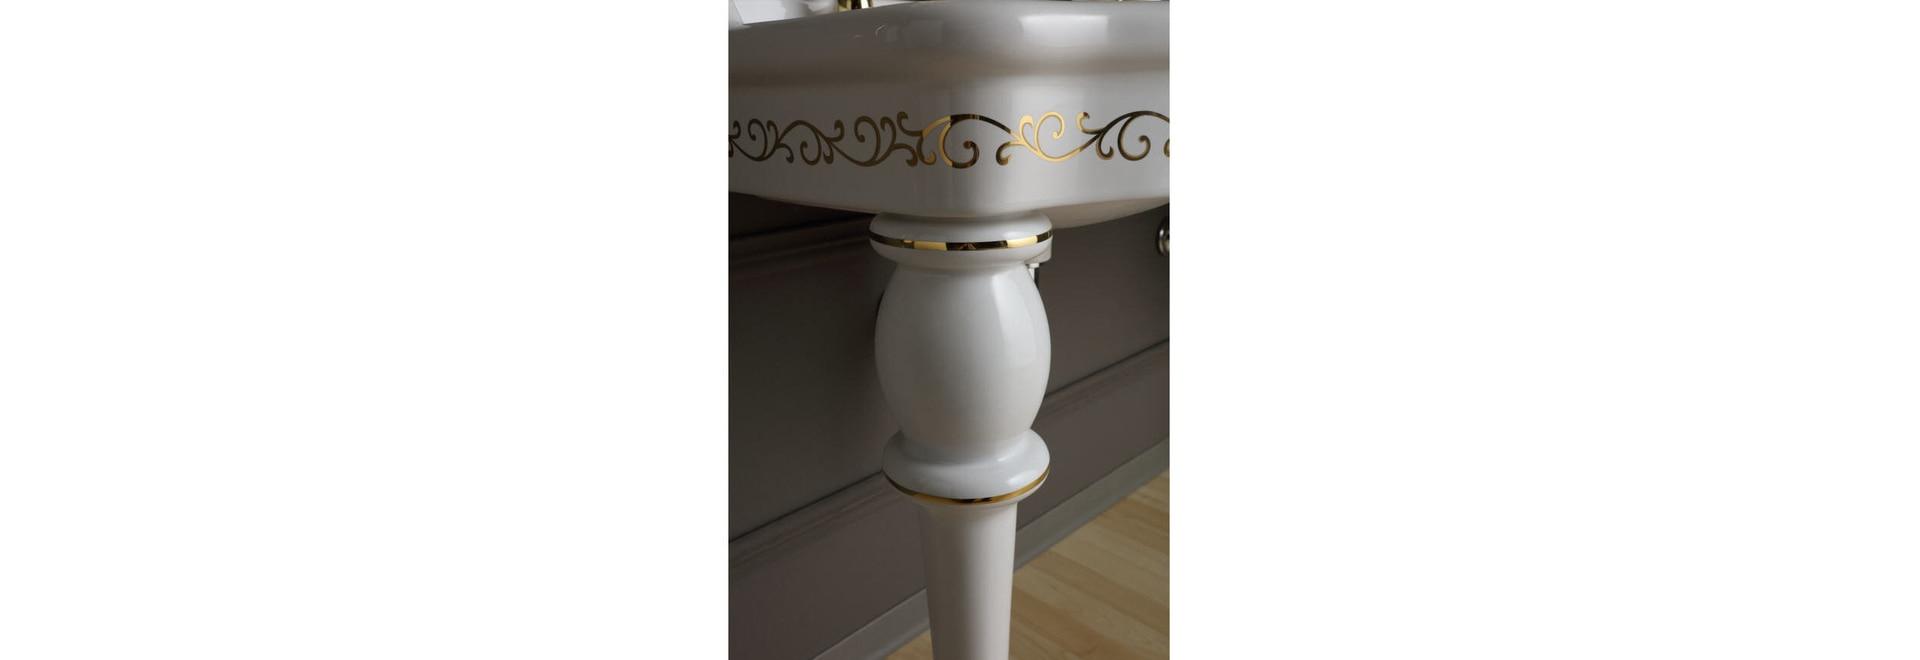 patterns on ceramics absolute luxury rome metropolitan city of